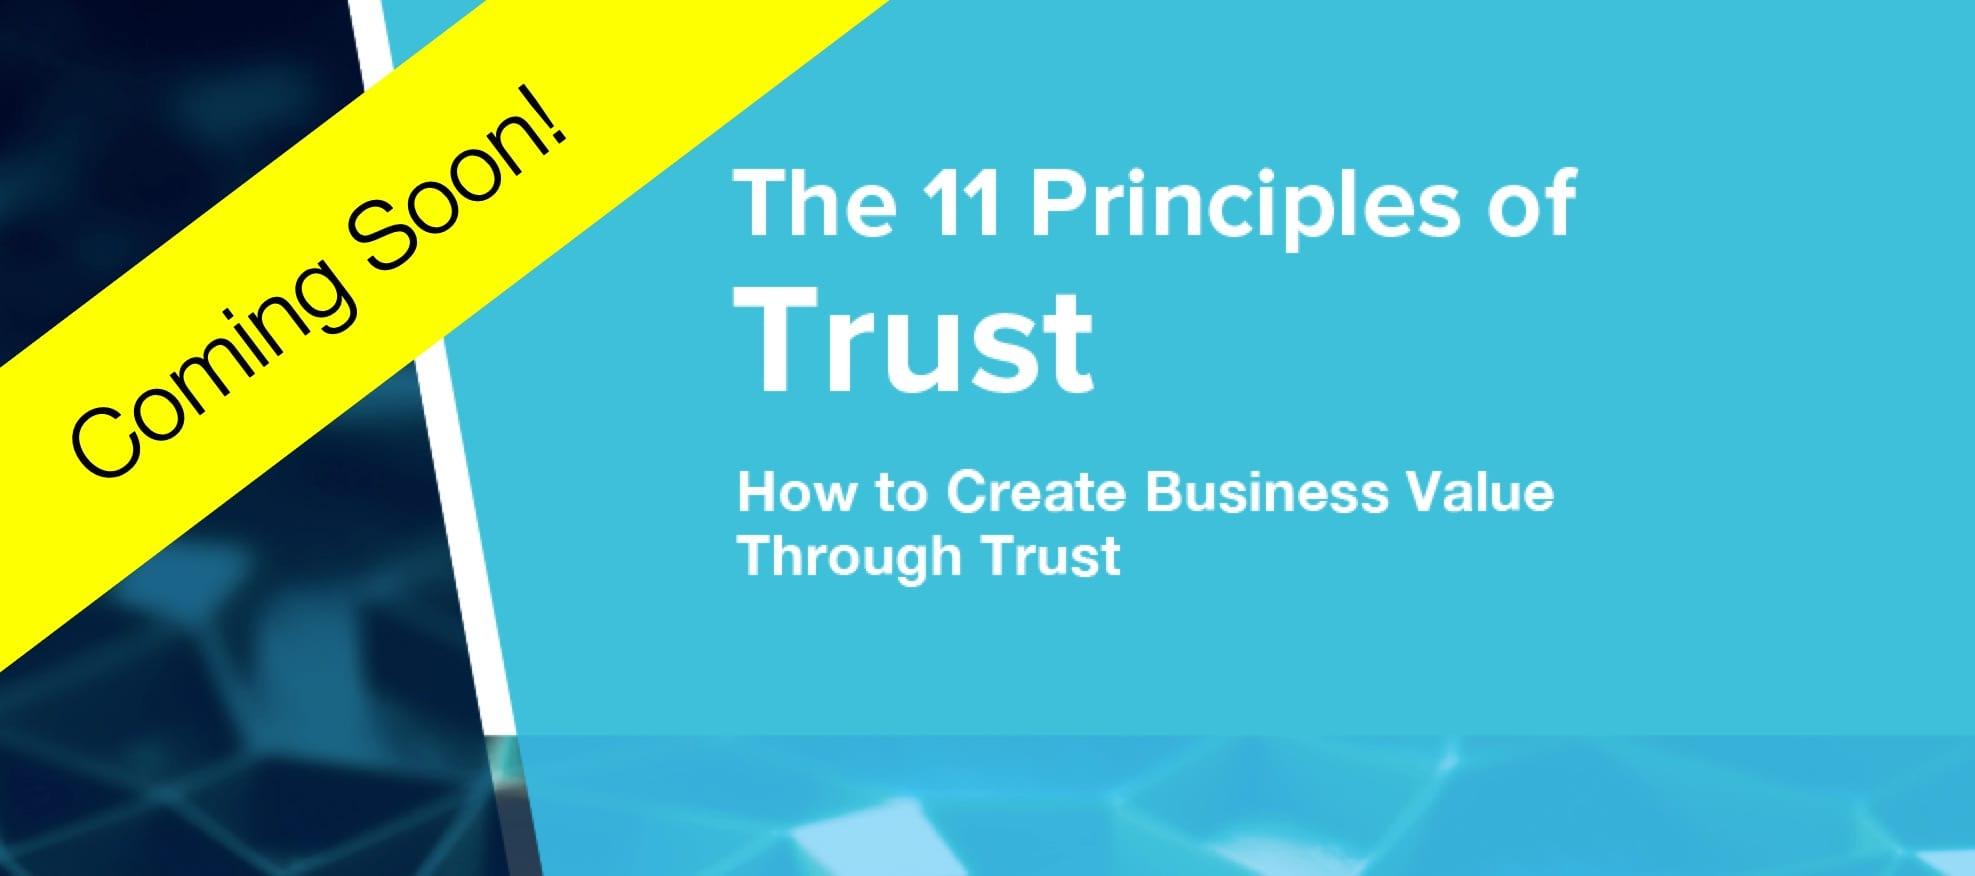 11-Principles-of-Trust-coming-soon